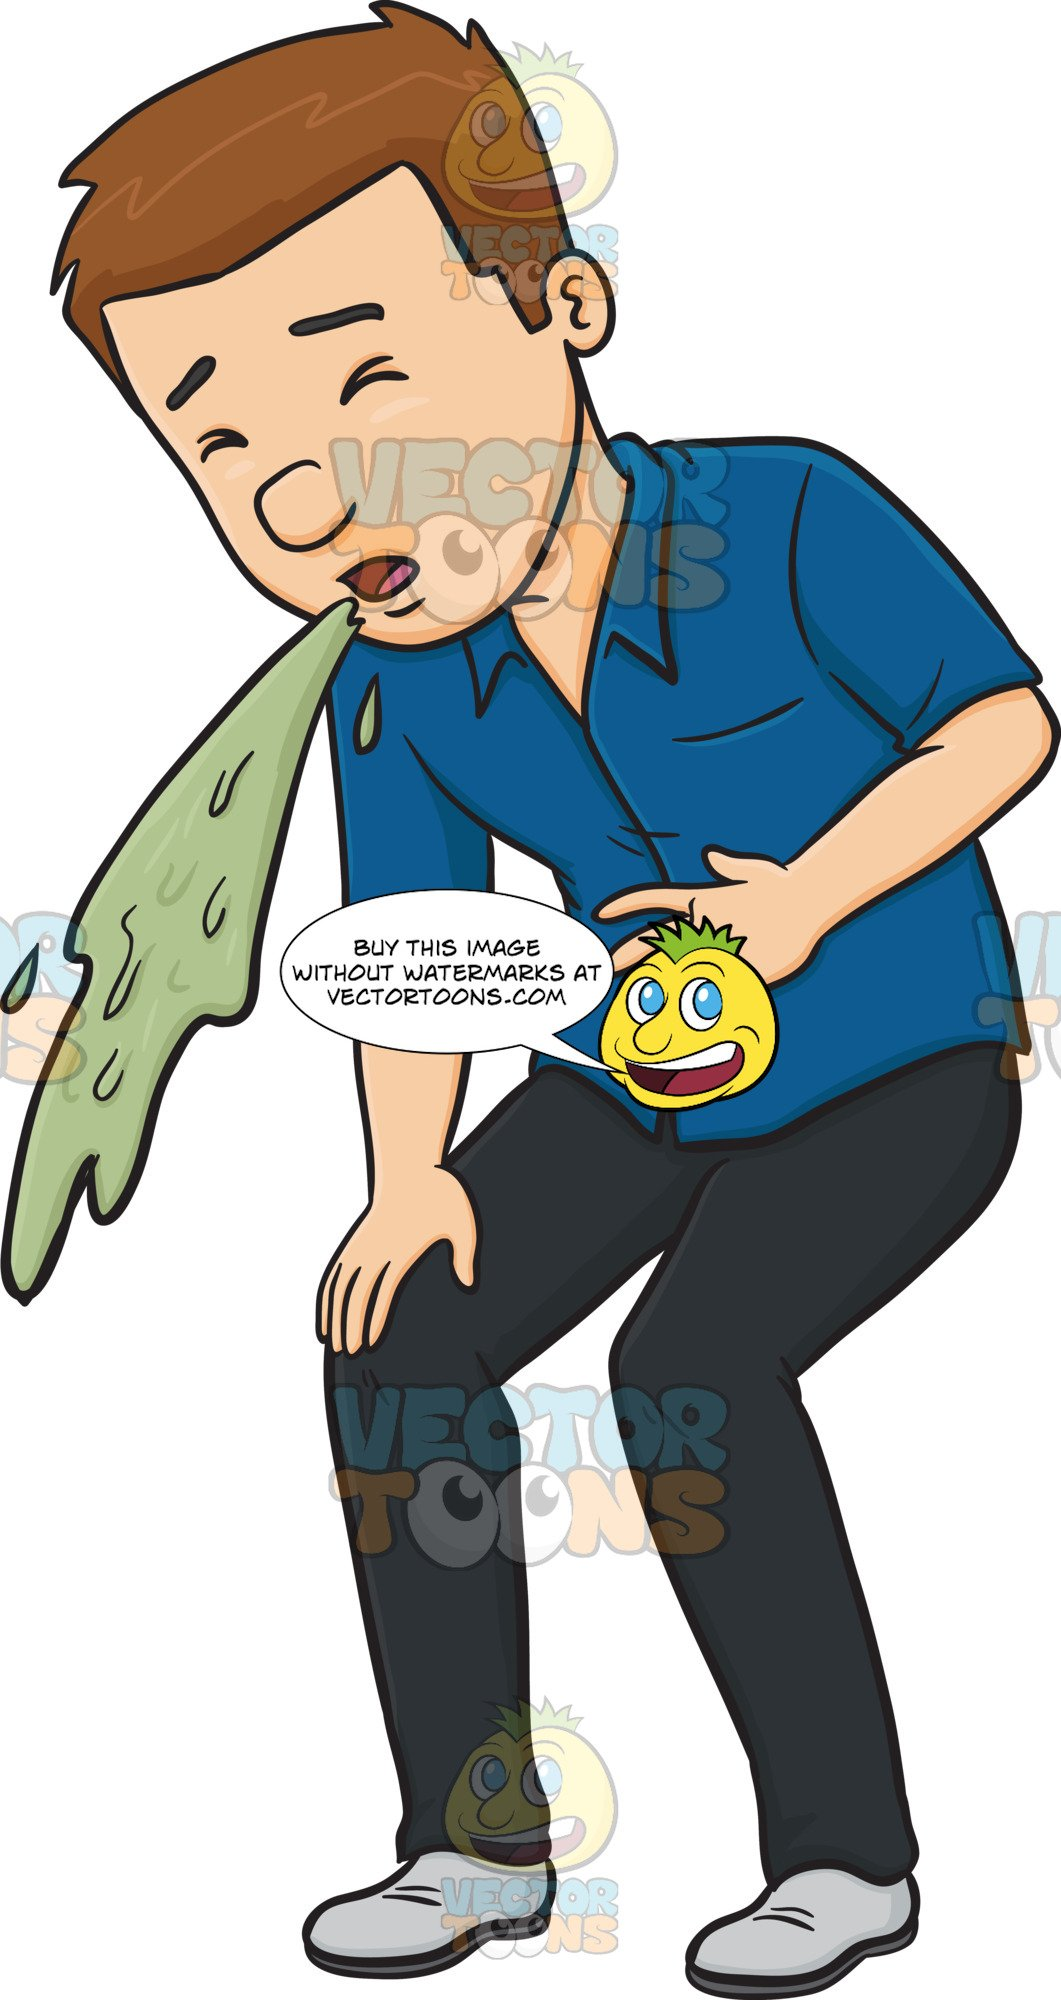 Man In A Blue Shirt Vomiting.